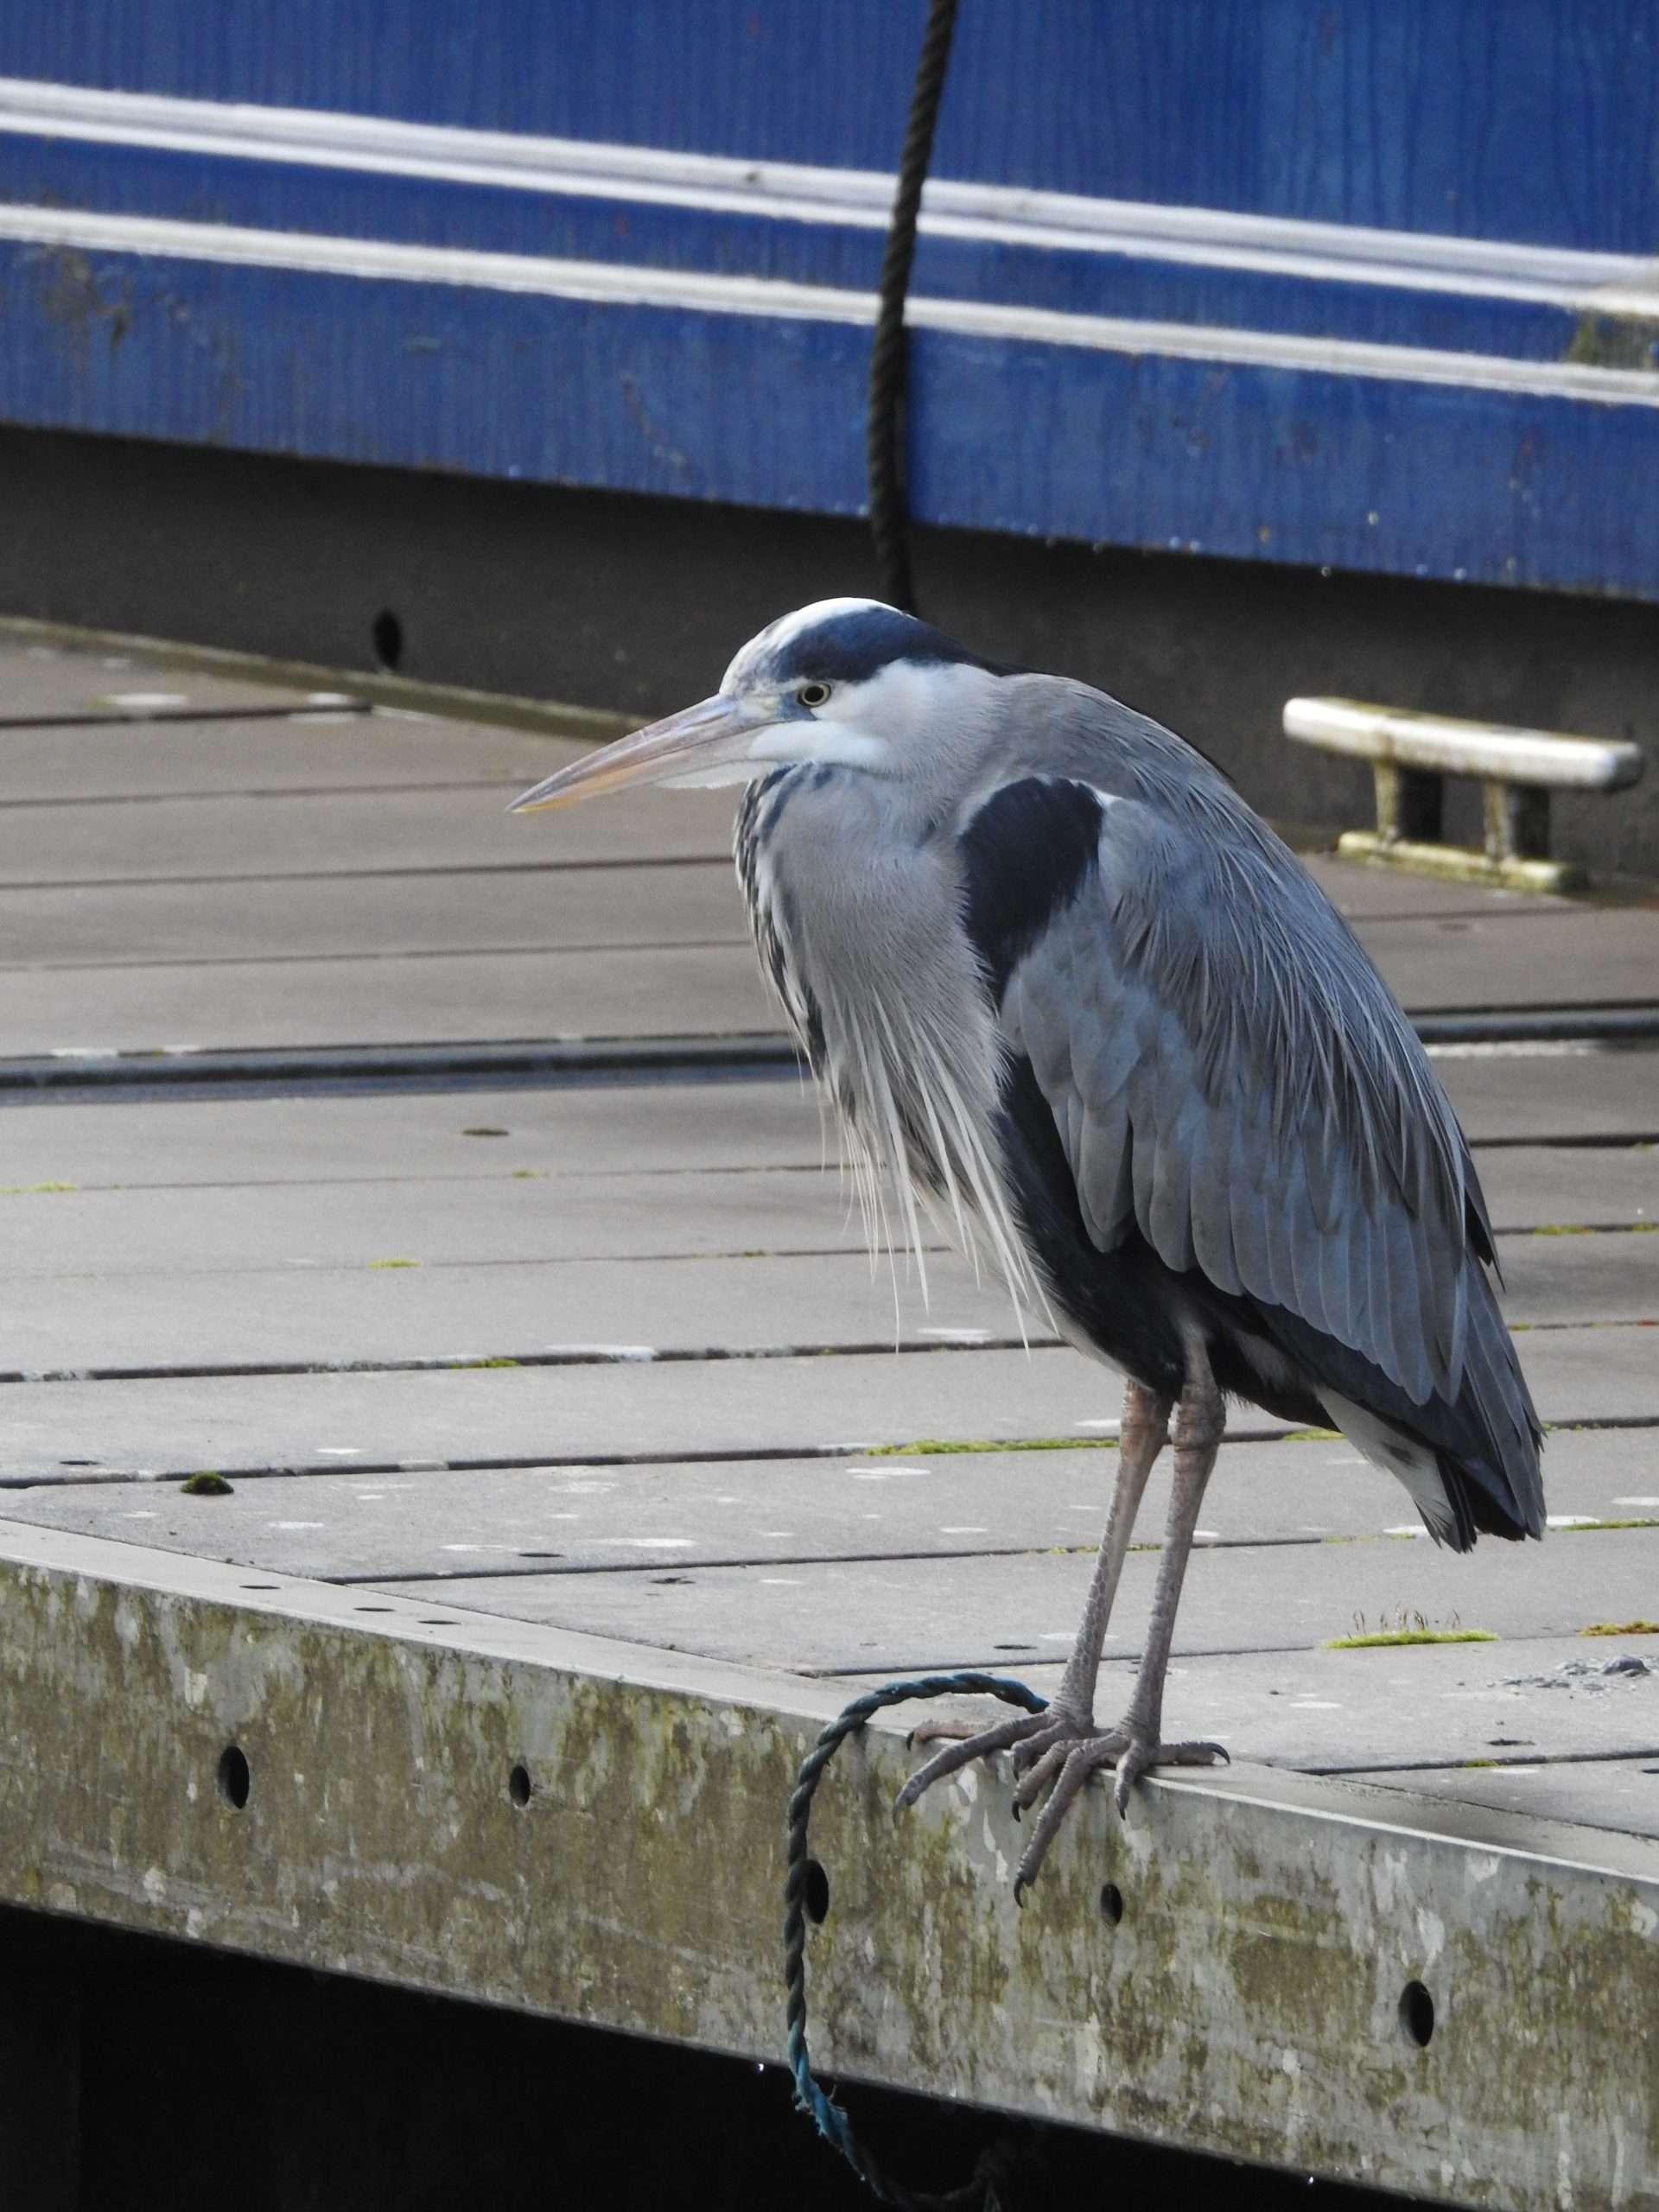 A Heron standing on pontoon